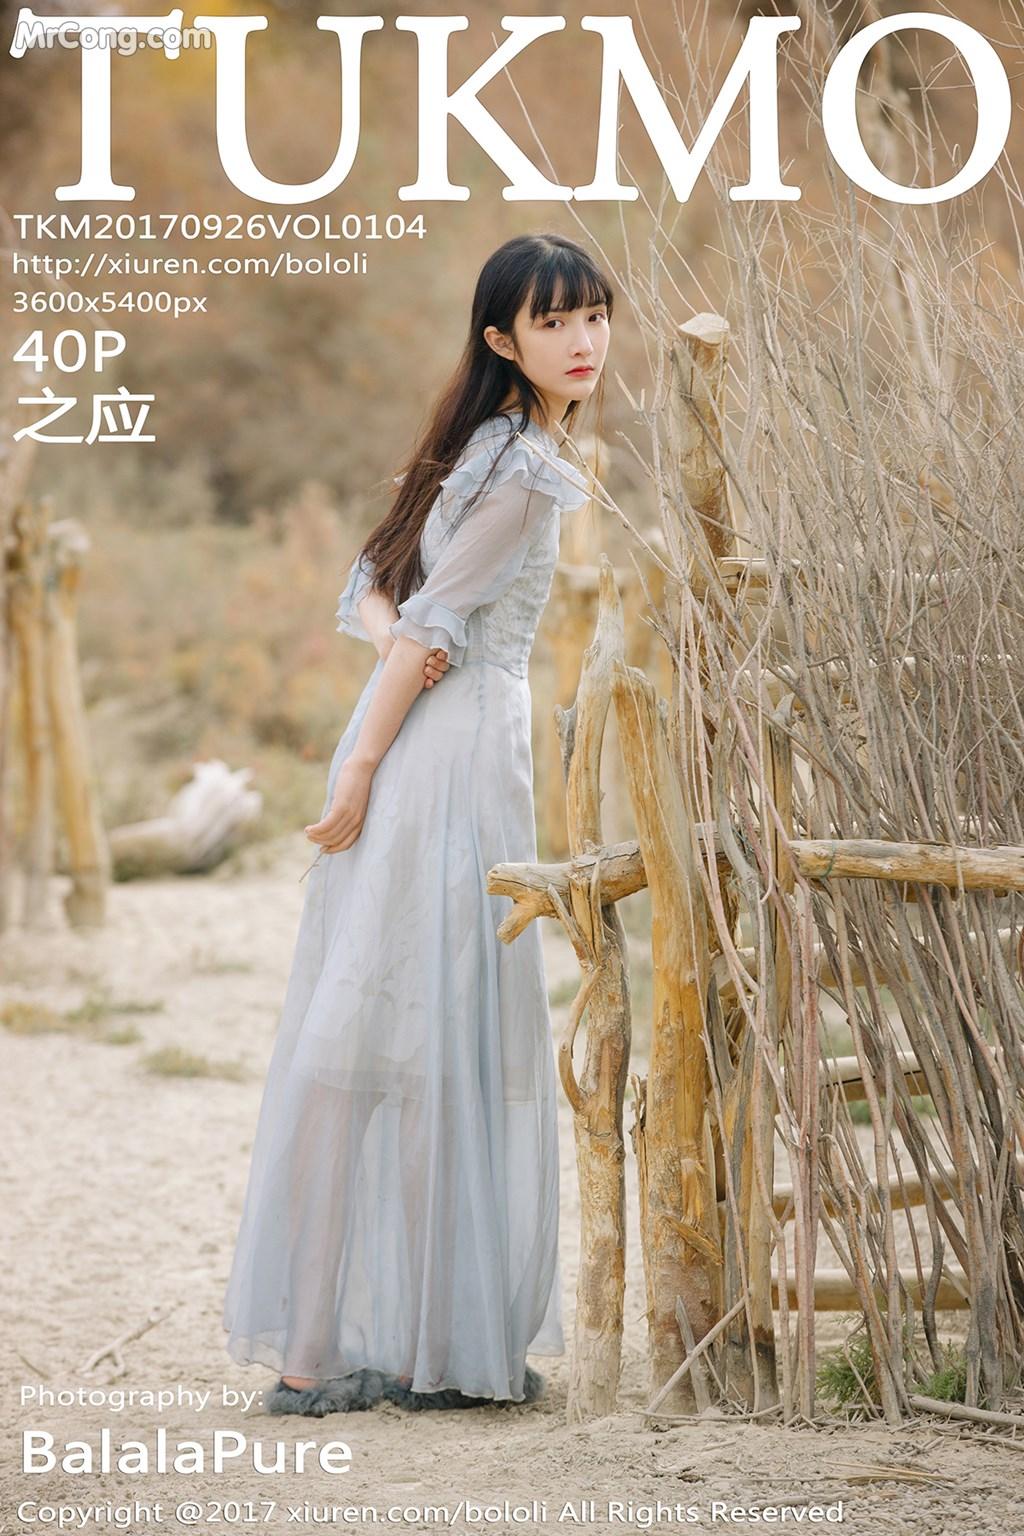 Tukmo Vol.104: Người mẫu Zhi Ying (之应) (41 ảnh)